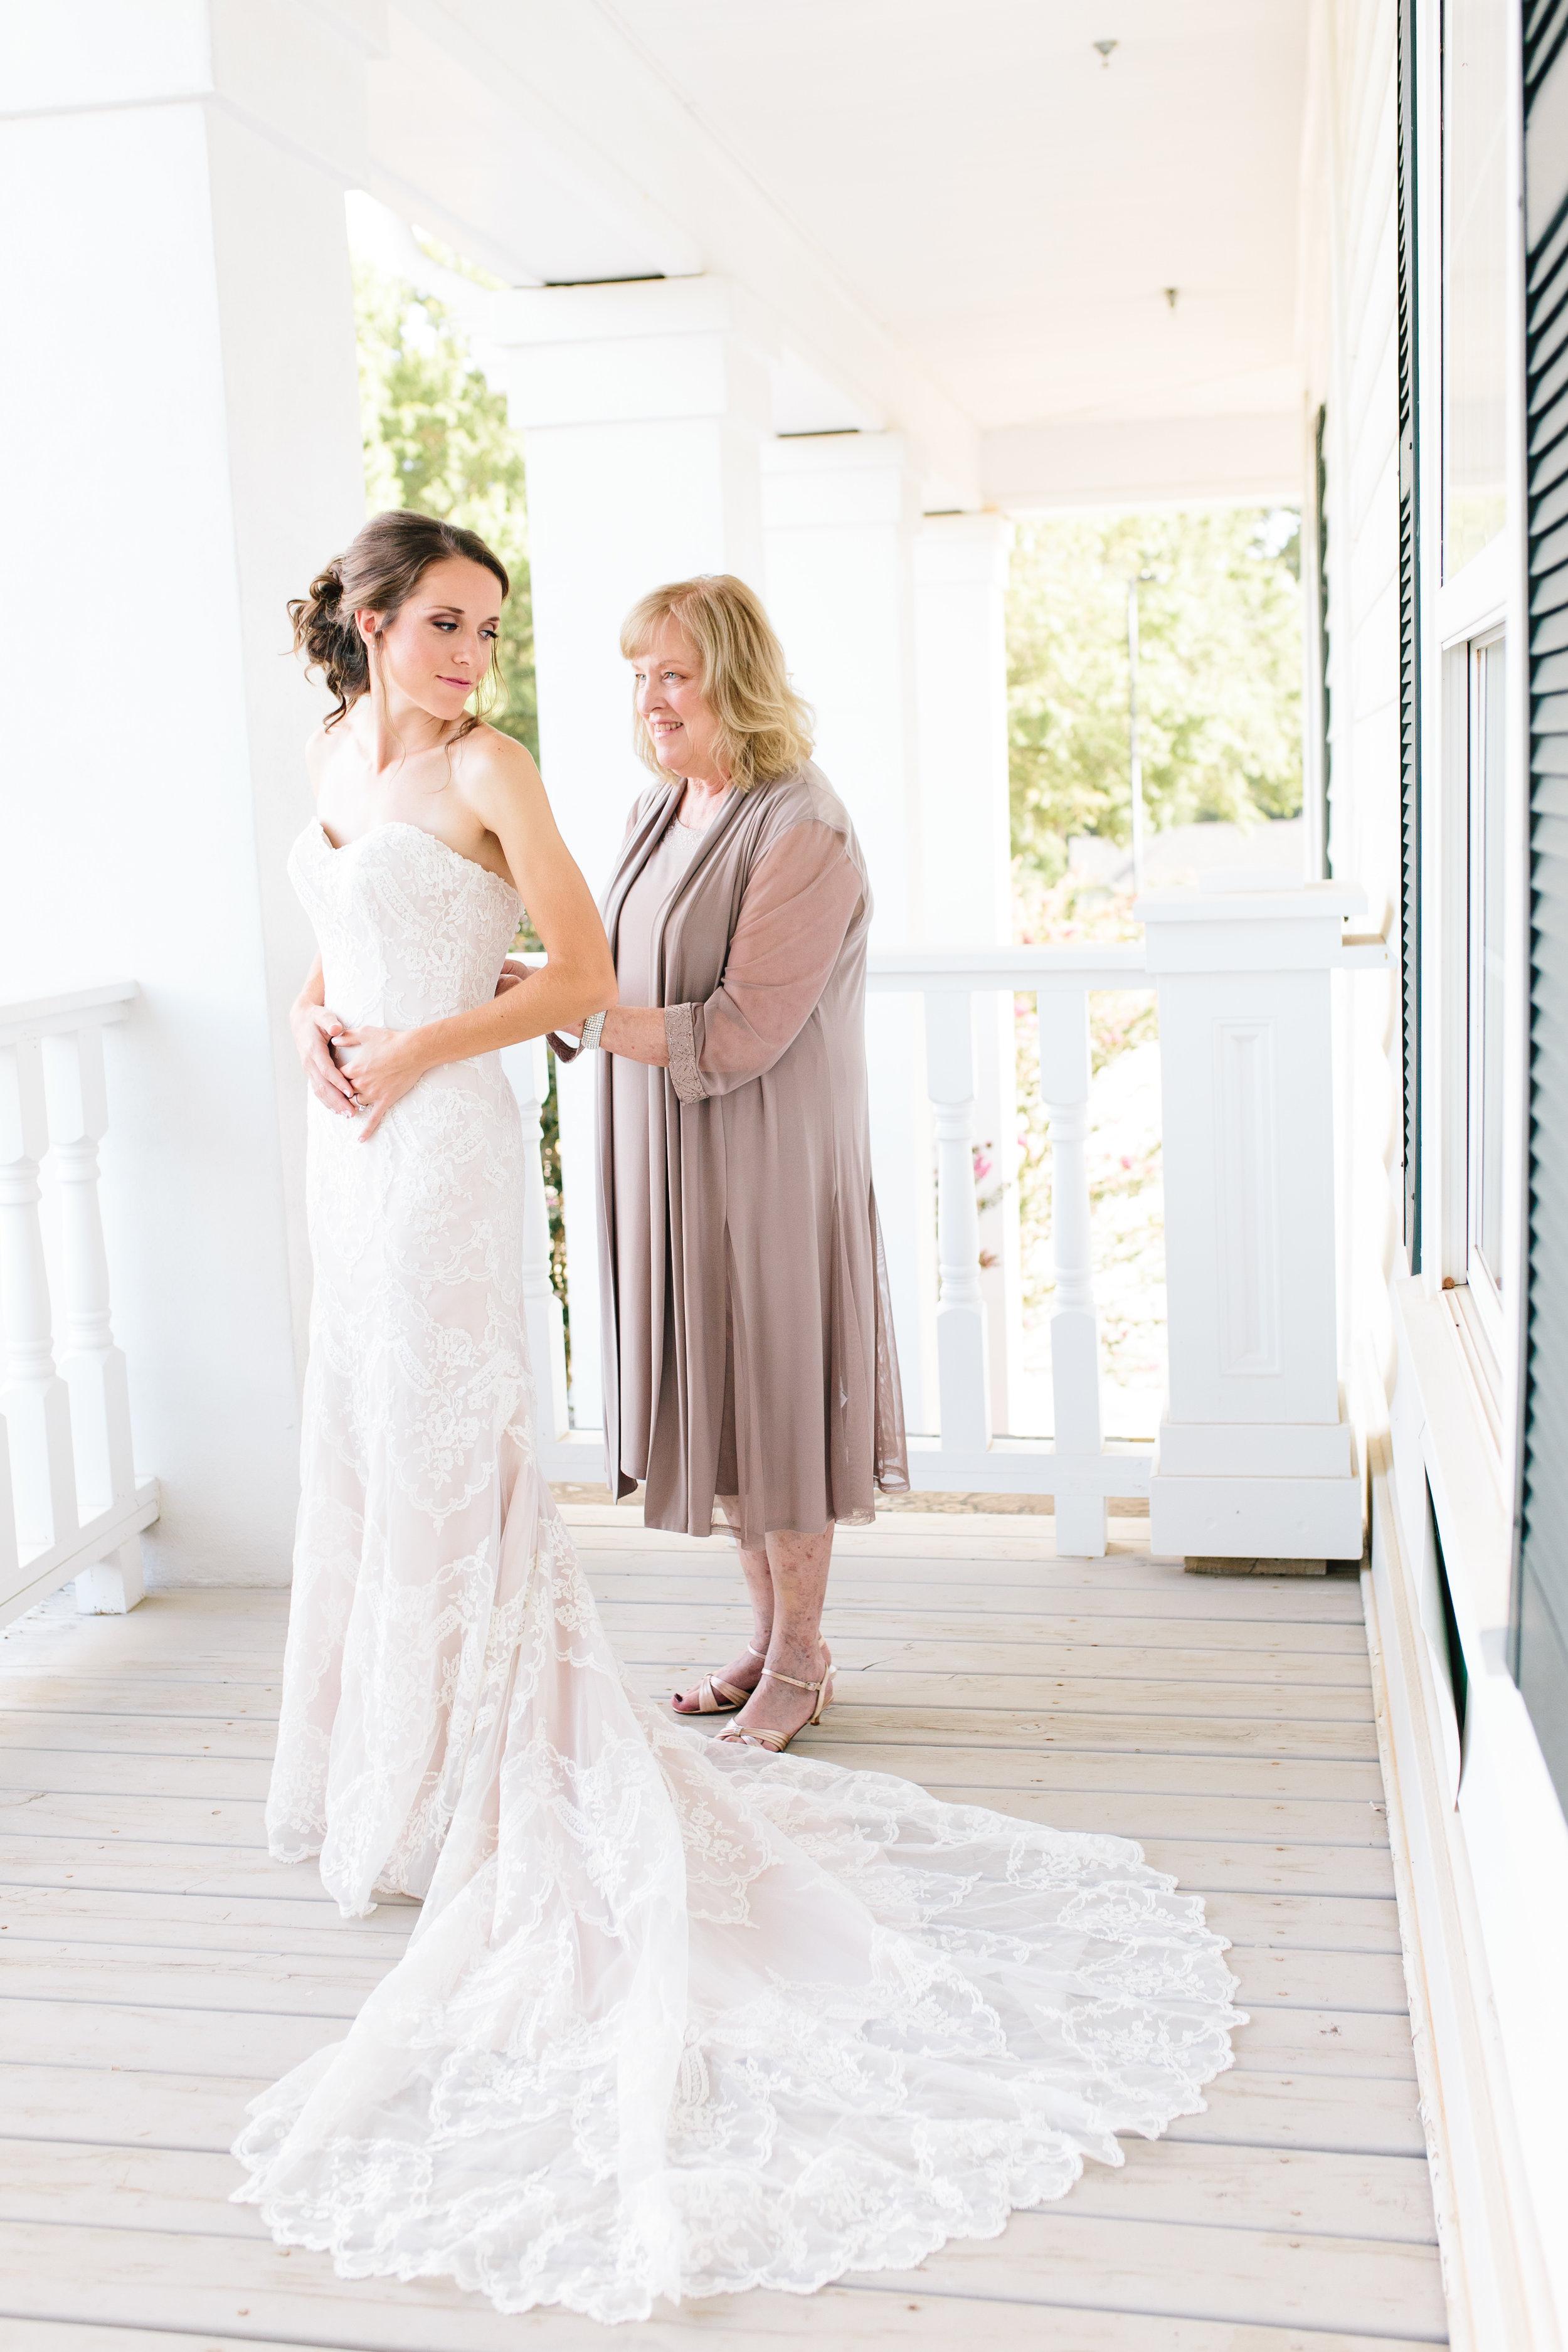 Emily + Austin Wedding (40 of 256).jpg